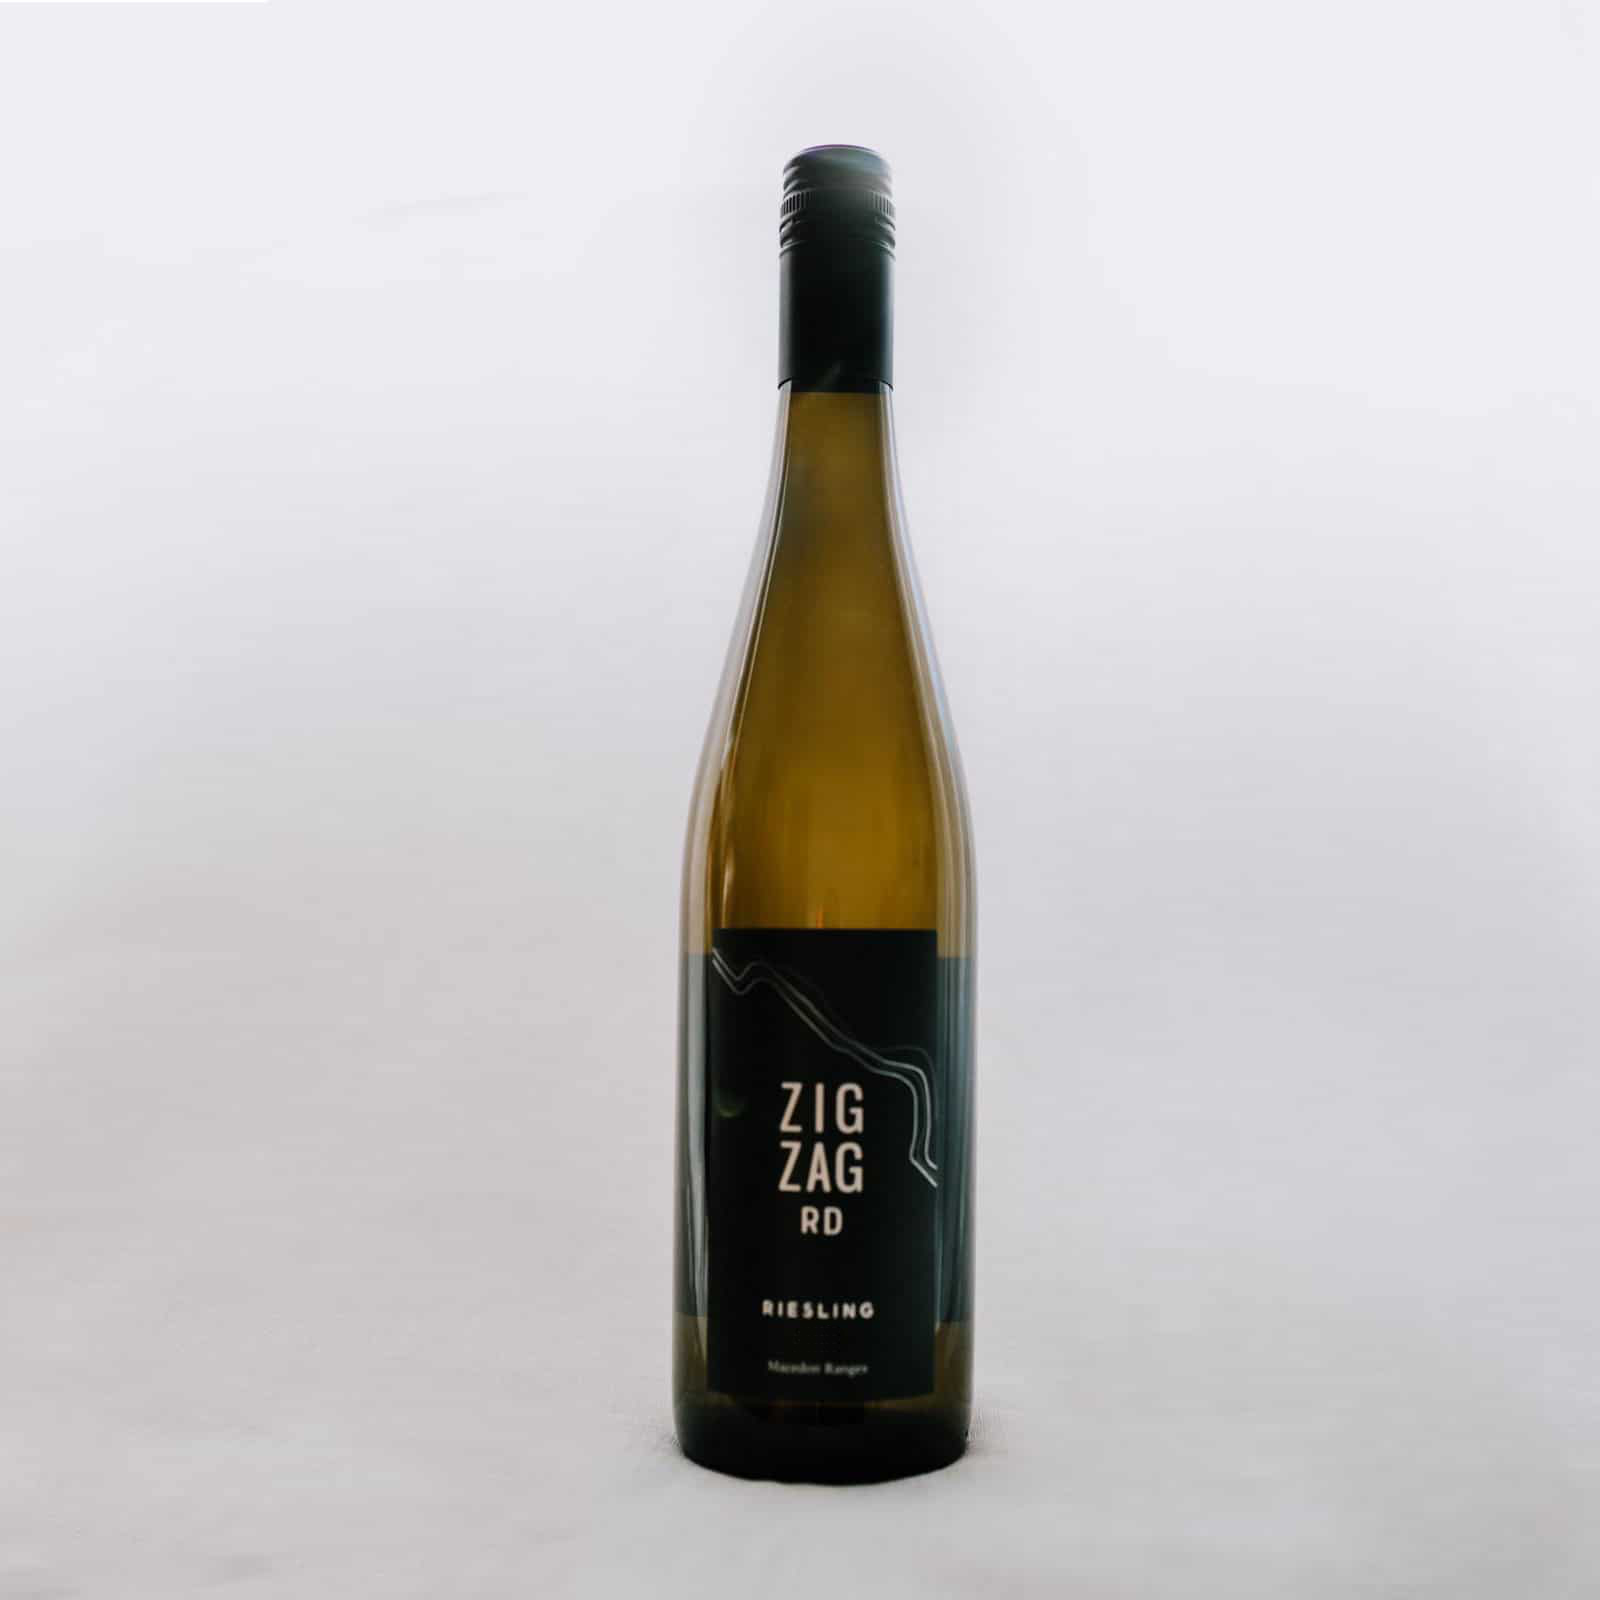 Zig Zag Rd Wines Reisling 2020